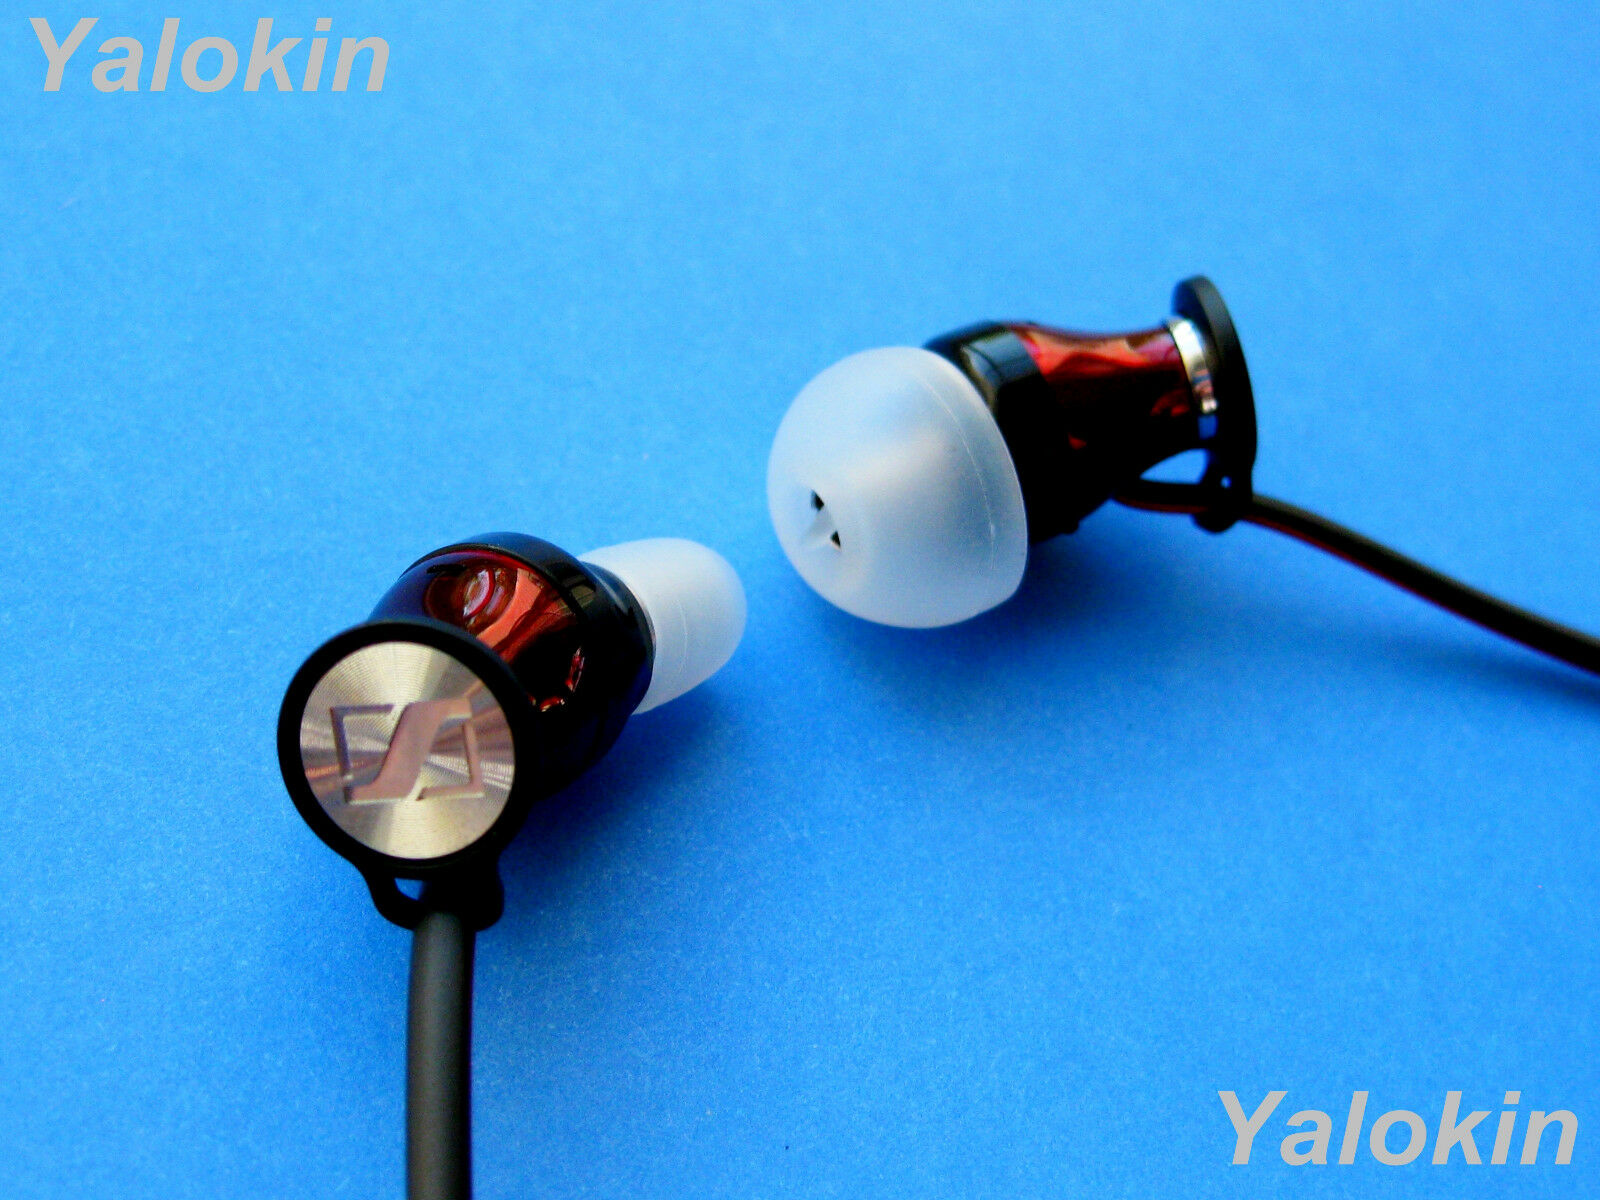 CL-NSEN 16pcs XS//S//M//L Comfort Eartips buds for Sennheiser Momentum Earphones